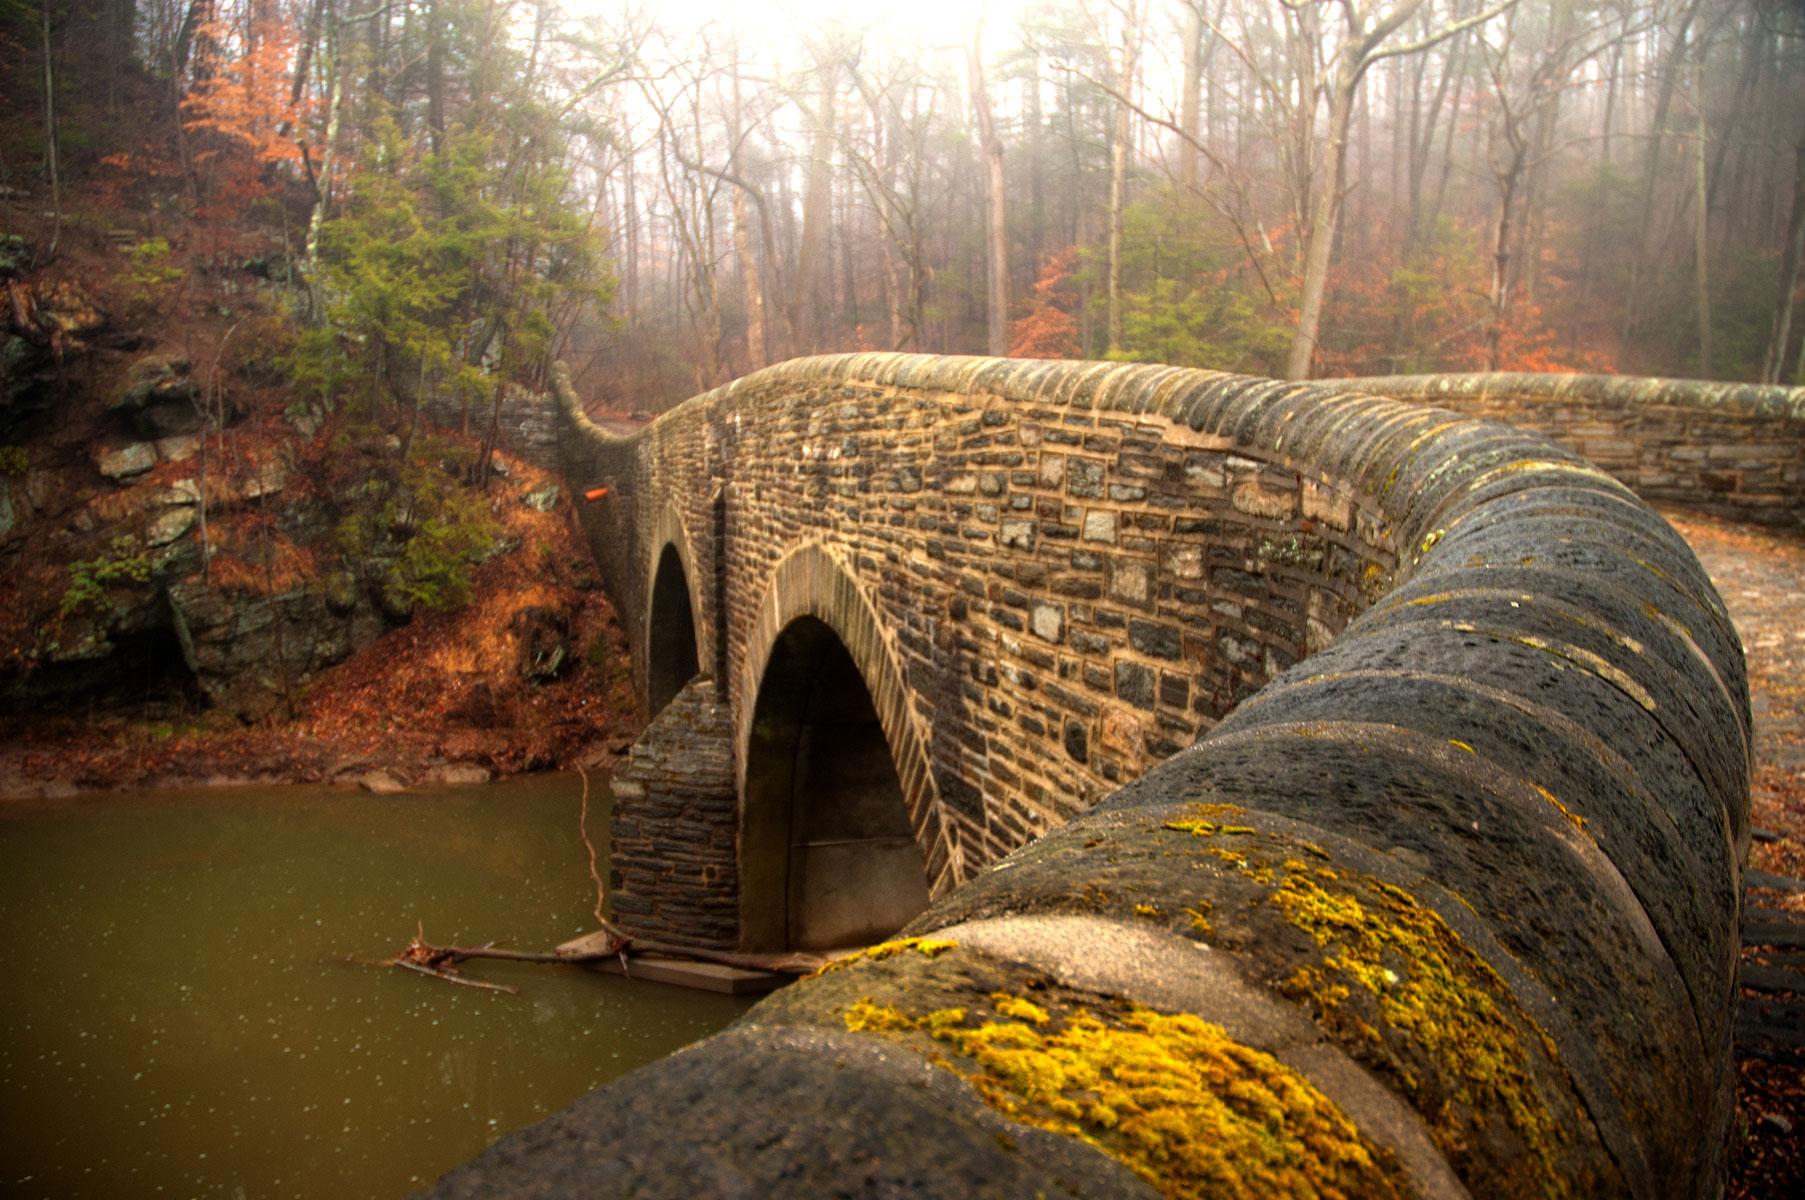 Bridge-of-the-Wissahickon